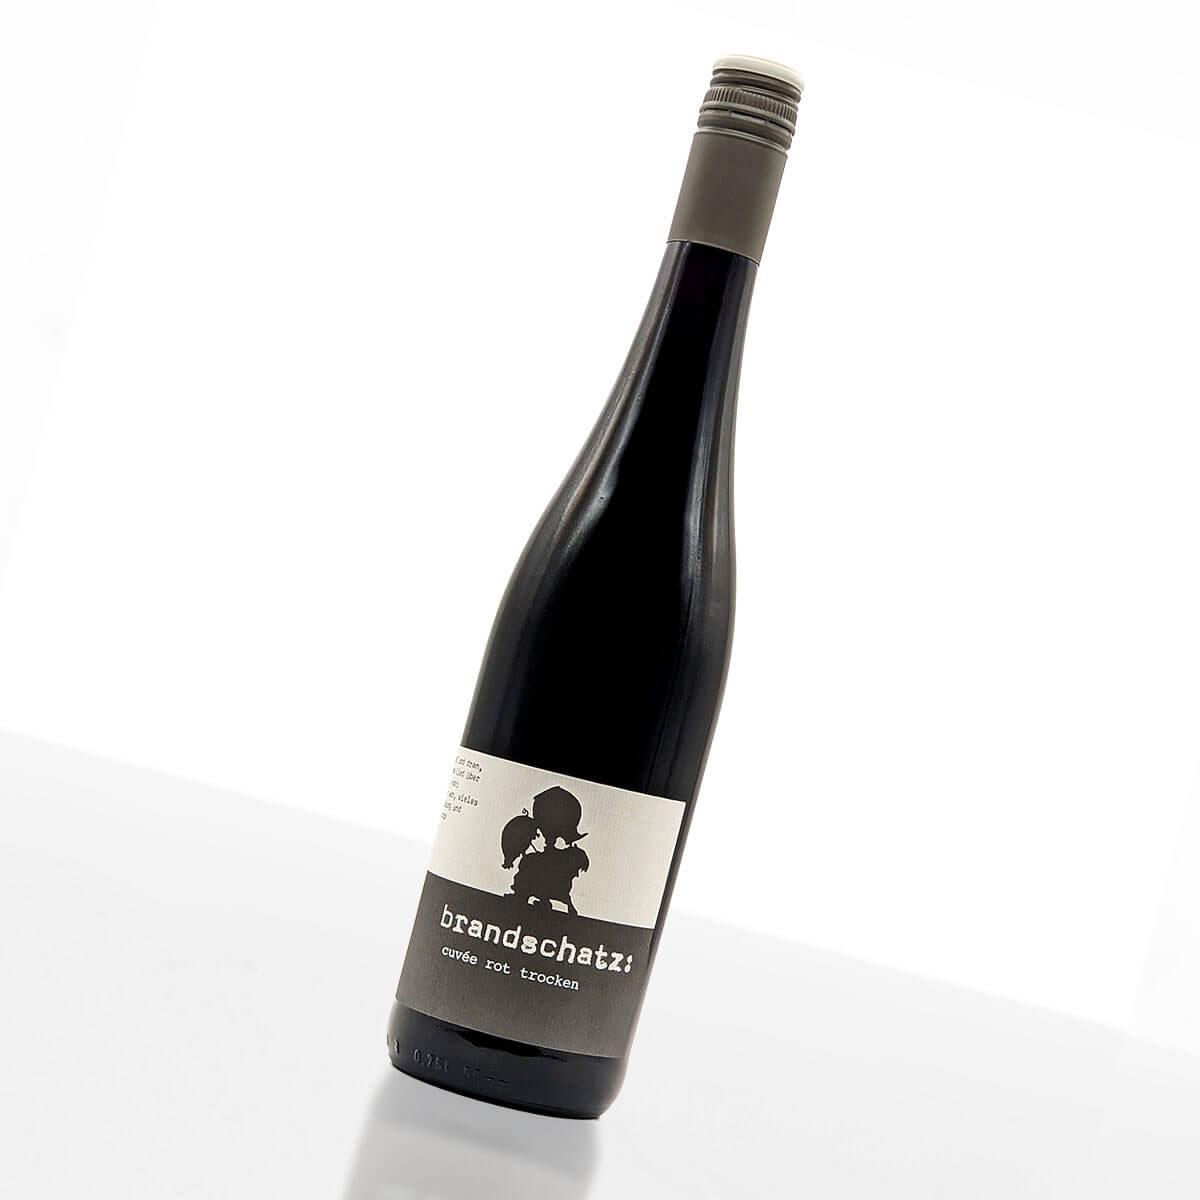 2017 Brandschatz Cuvée trocken • Weingut Schenk-Siebert